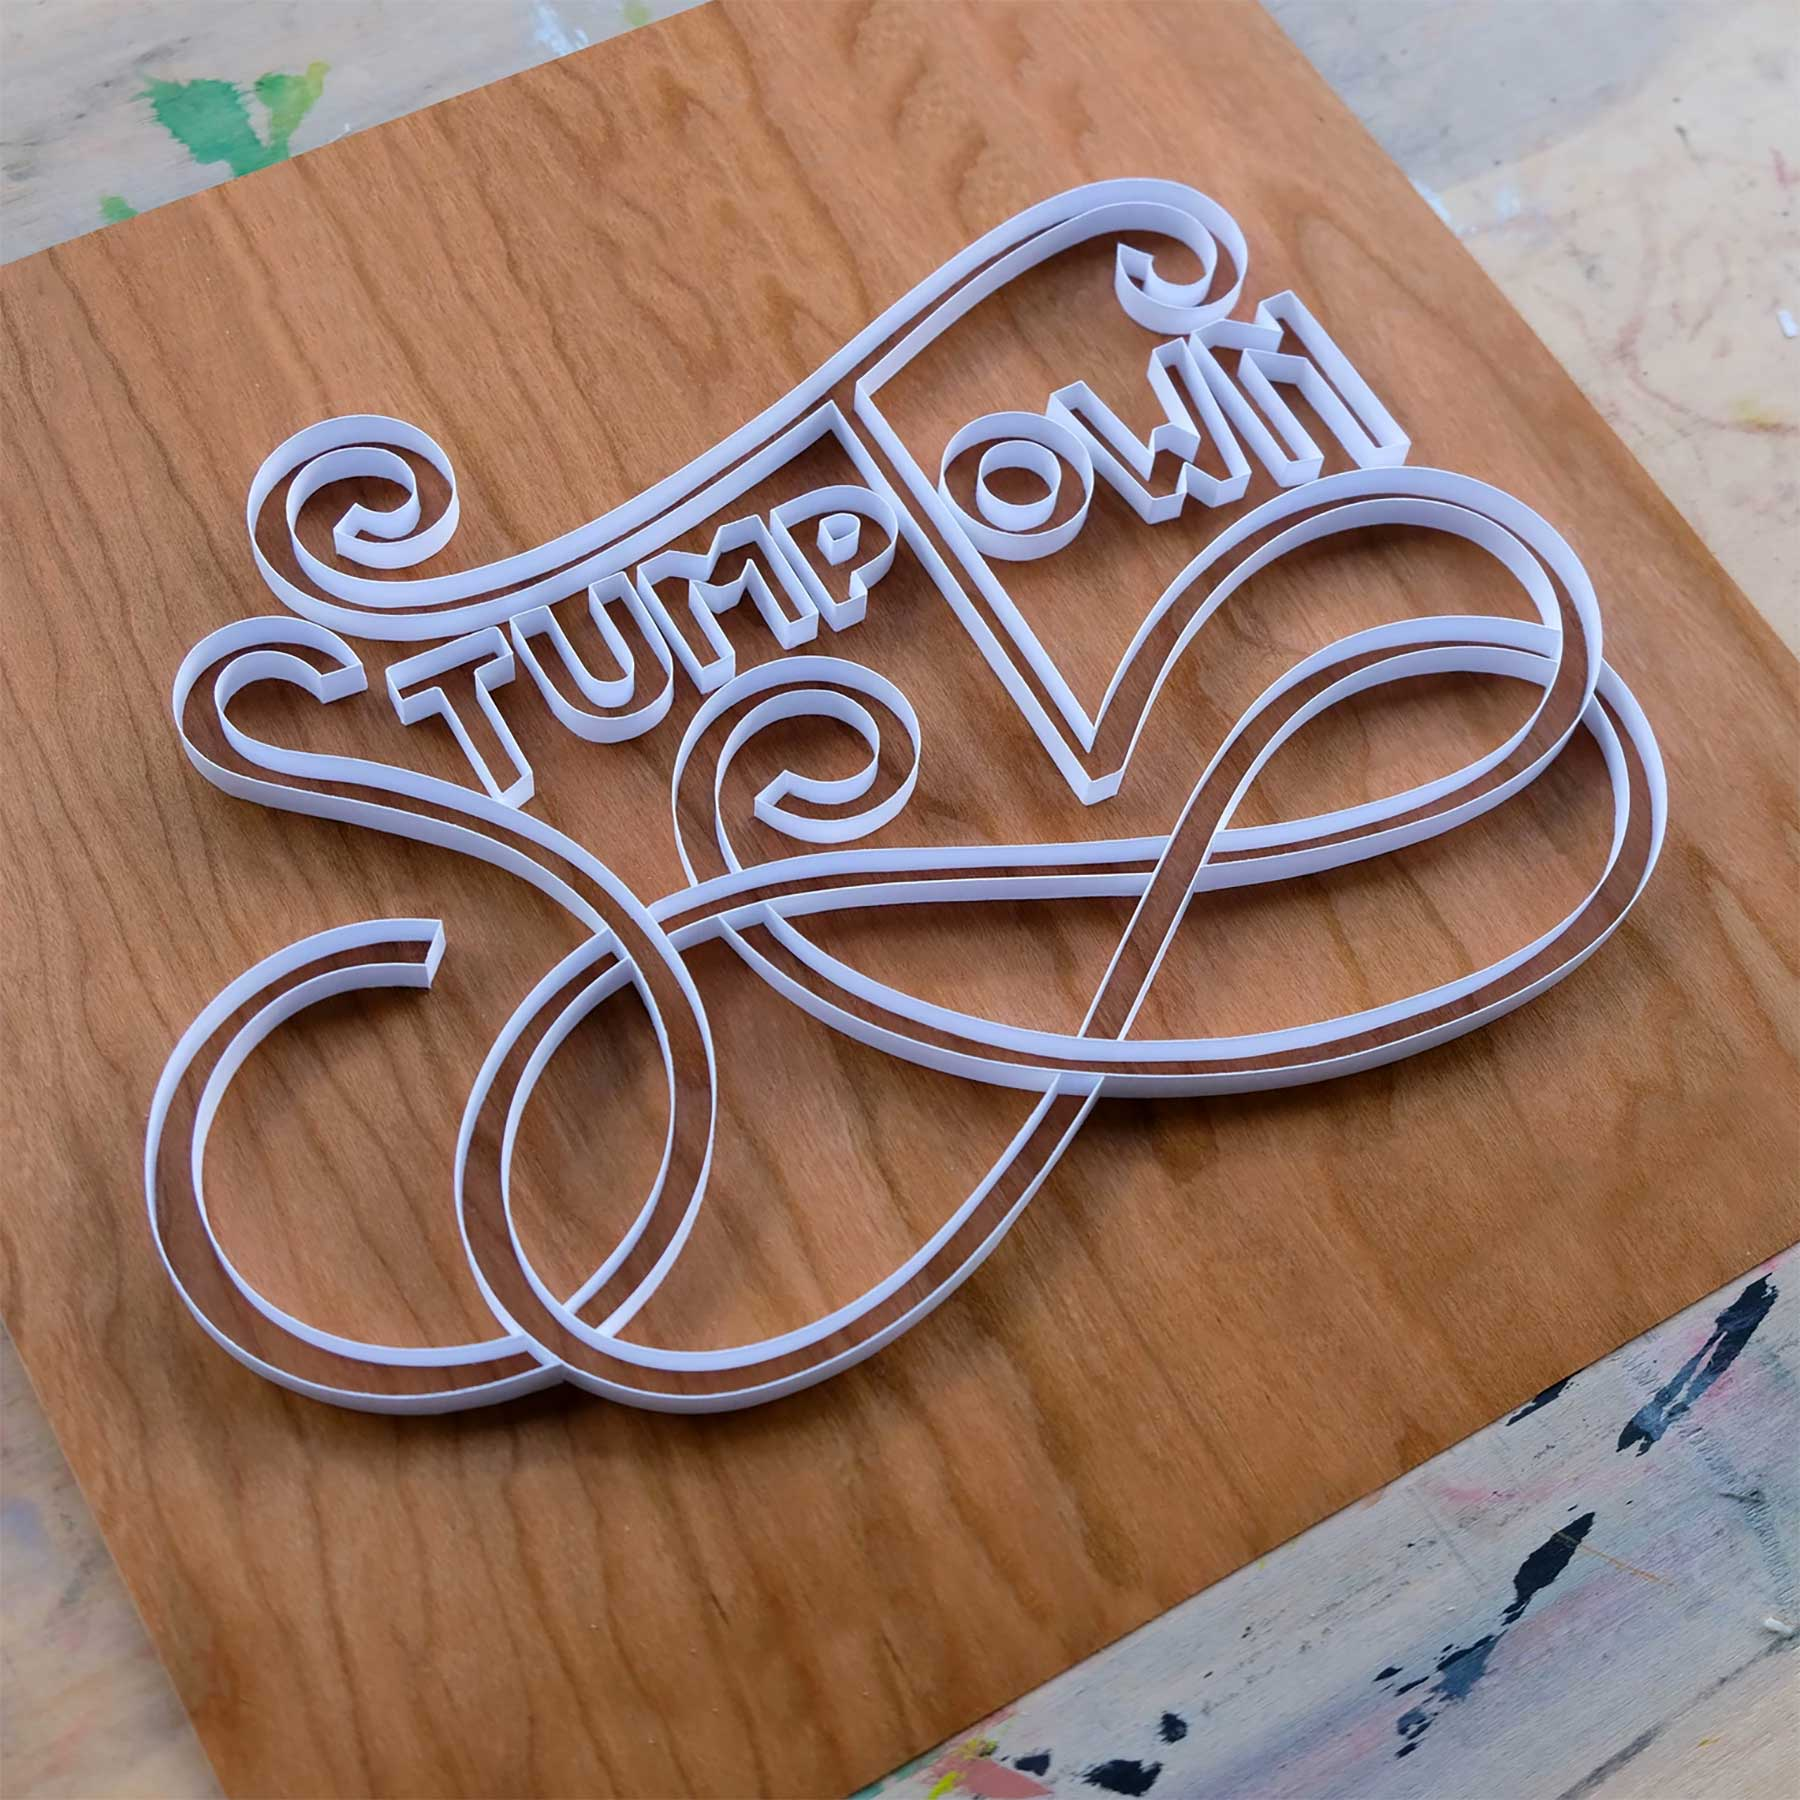 3D-Papier-Lettering von Alia Bright Alia-Bright-paperlettering_09